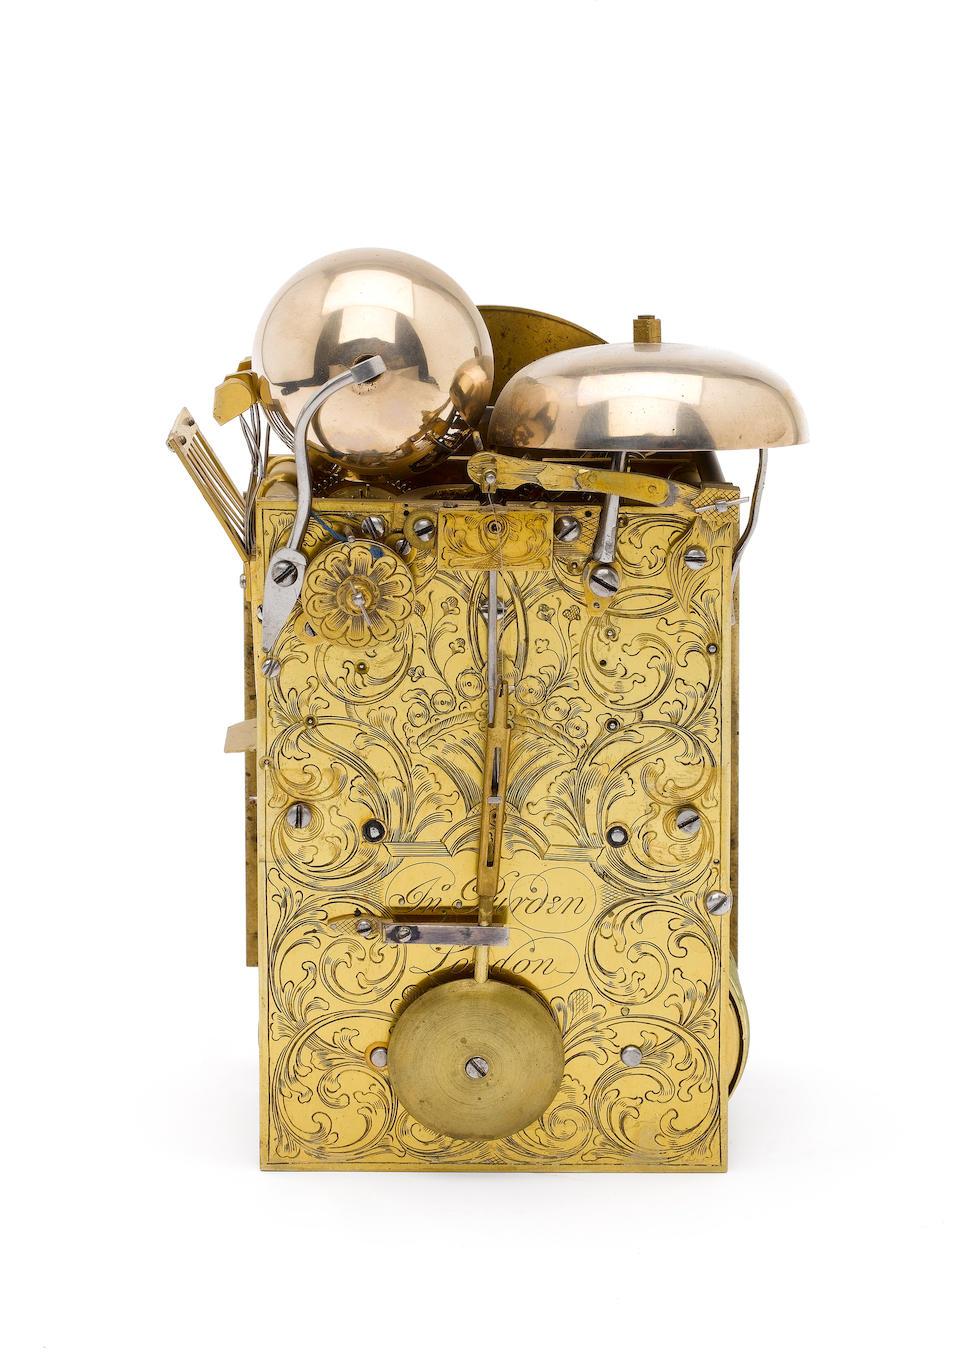 A good late 18th century small brass mounted ebonised single pad top quarter repeating bracket clock John Purden, London